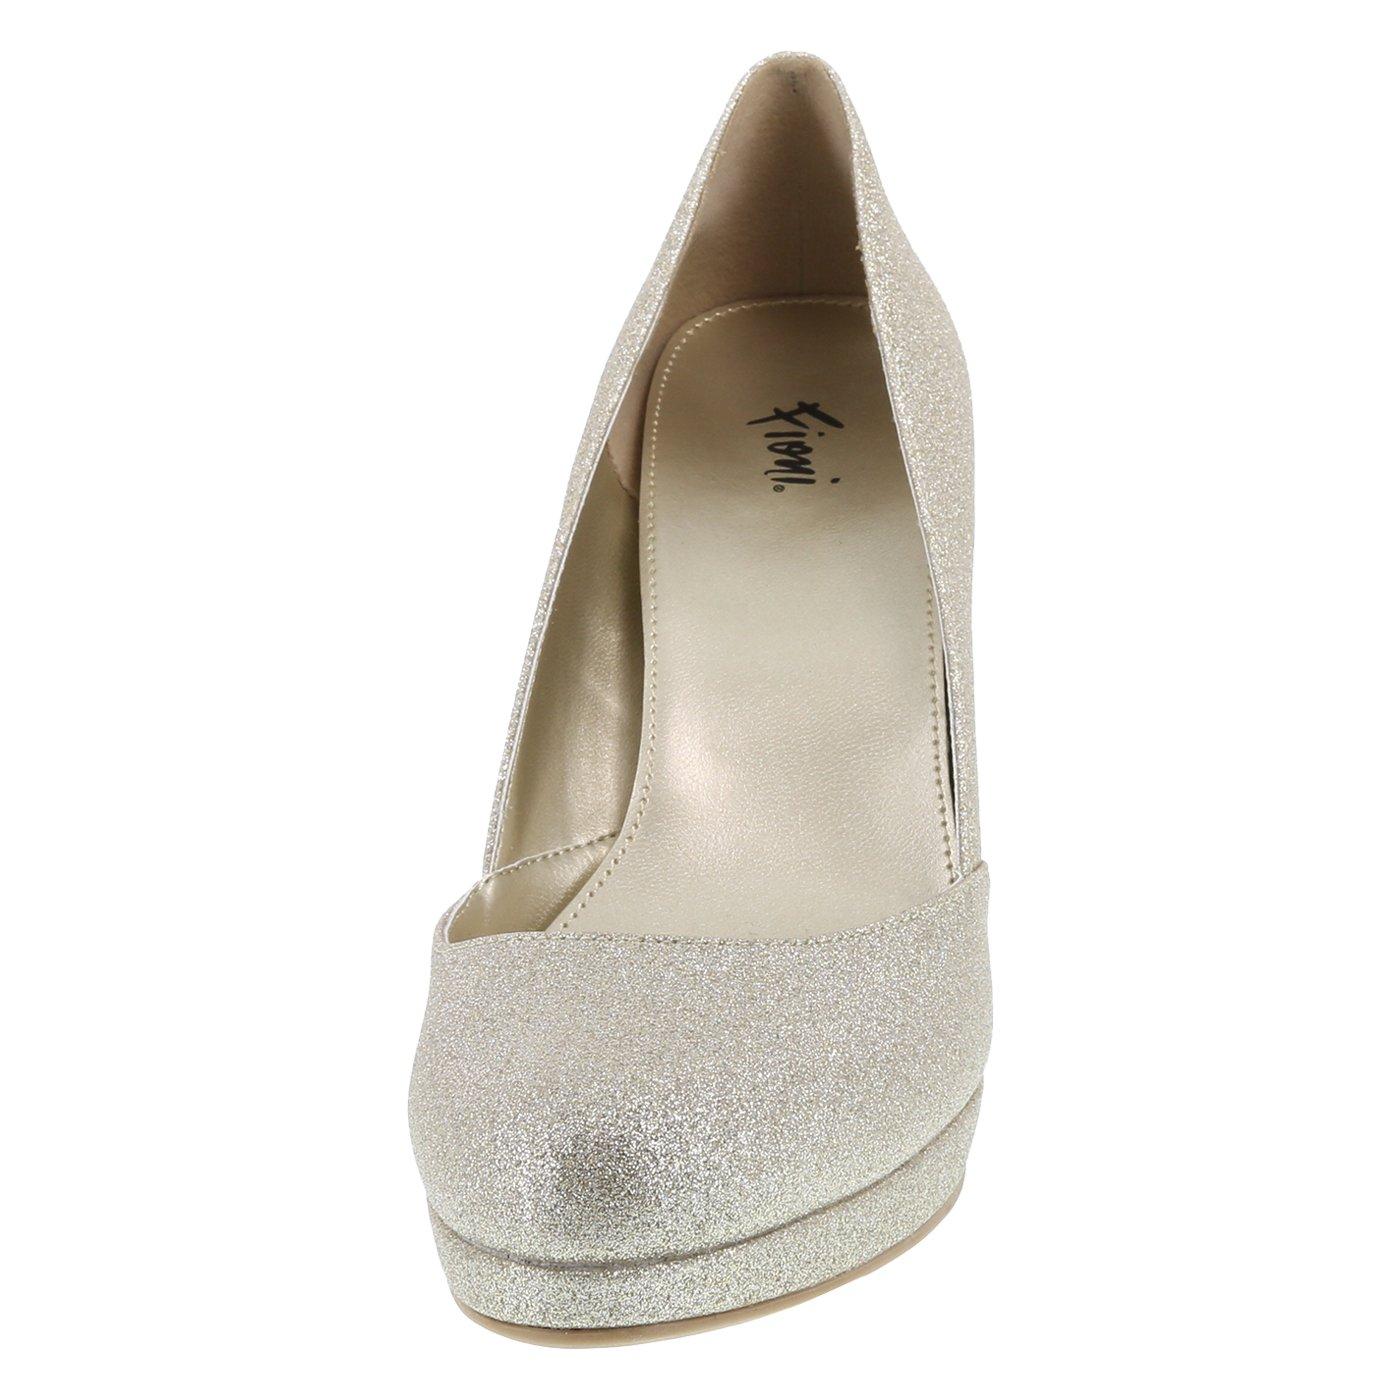 Fioni Gold Women's Jive Platform Heel 7.5 Regular by Fioni (Image #4)